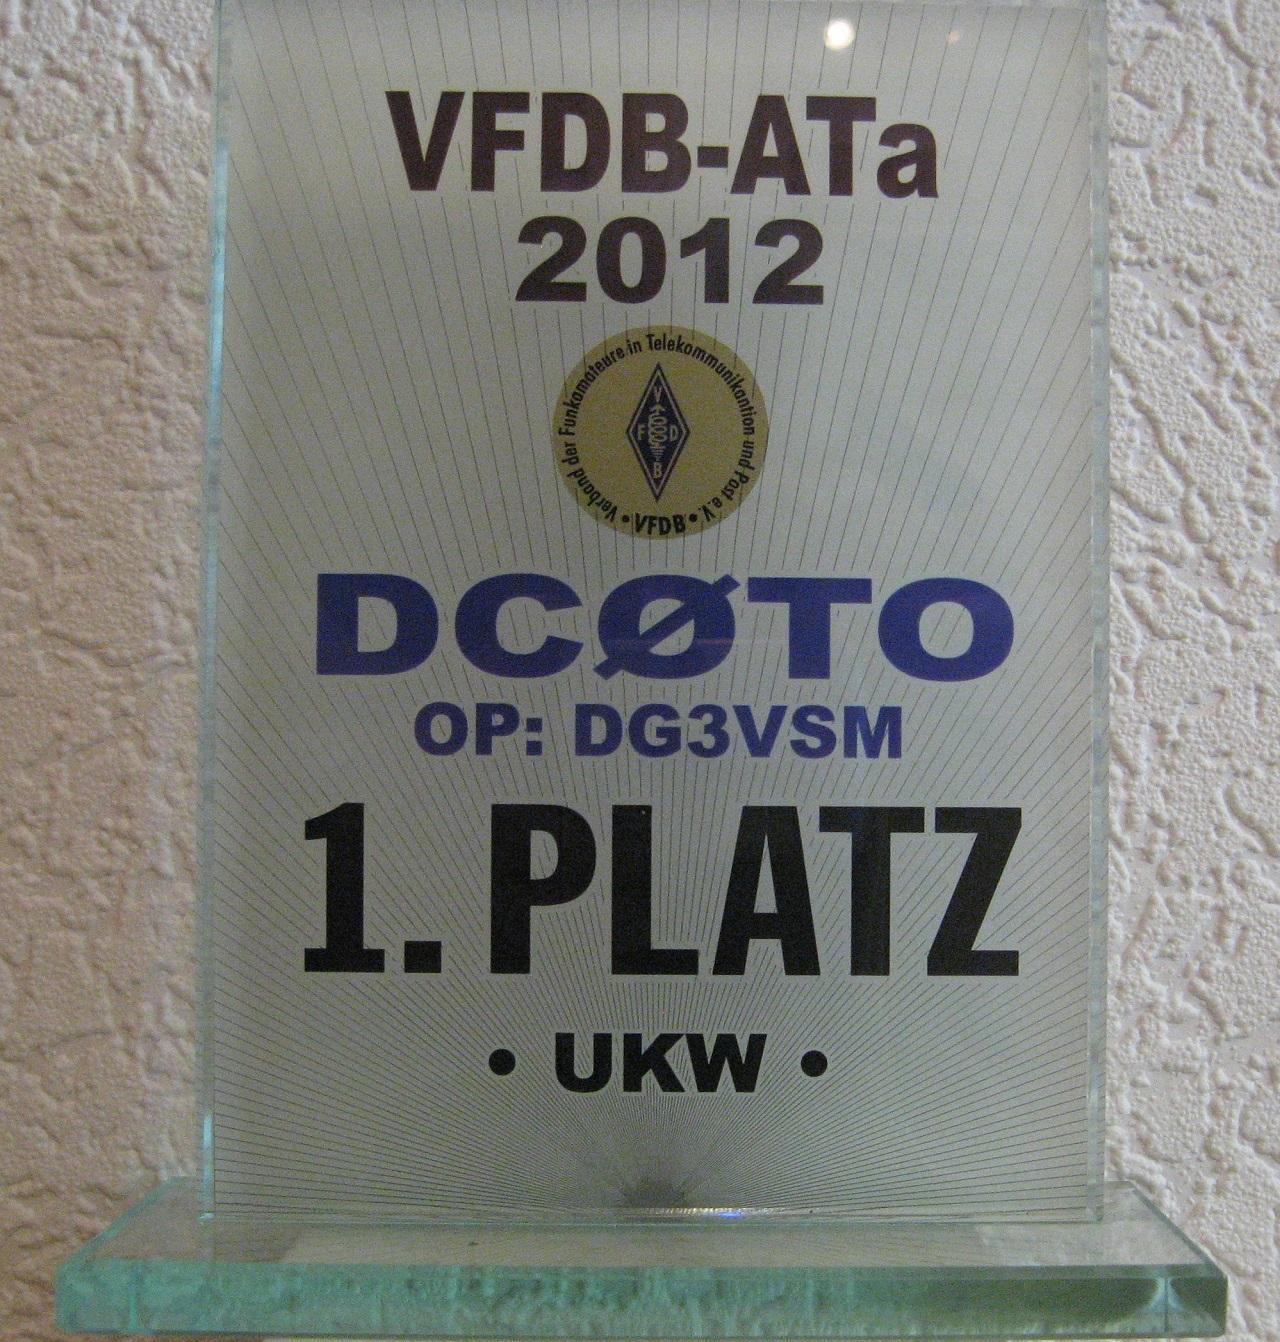 VFDB- Aktivitätstage